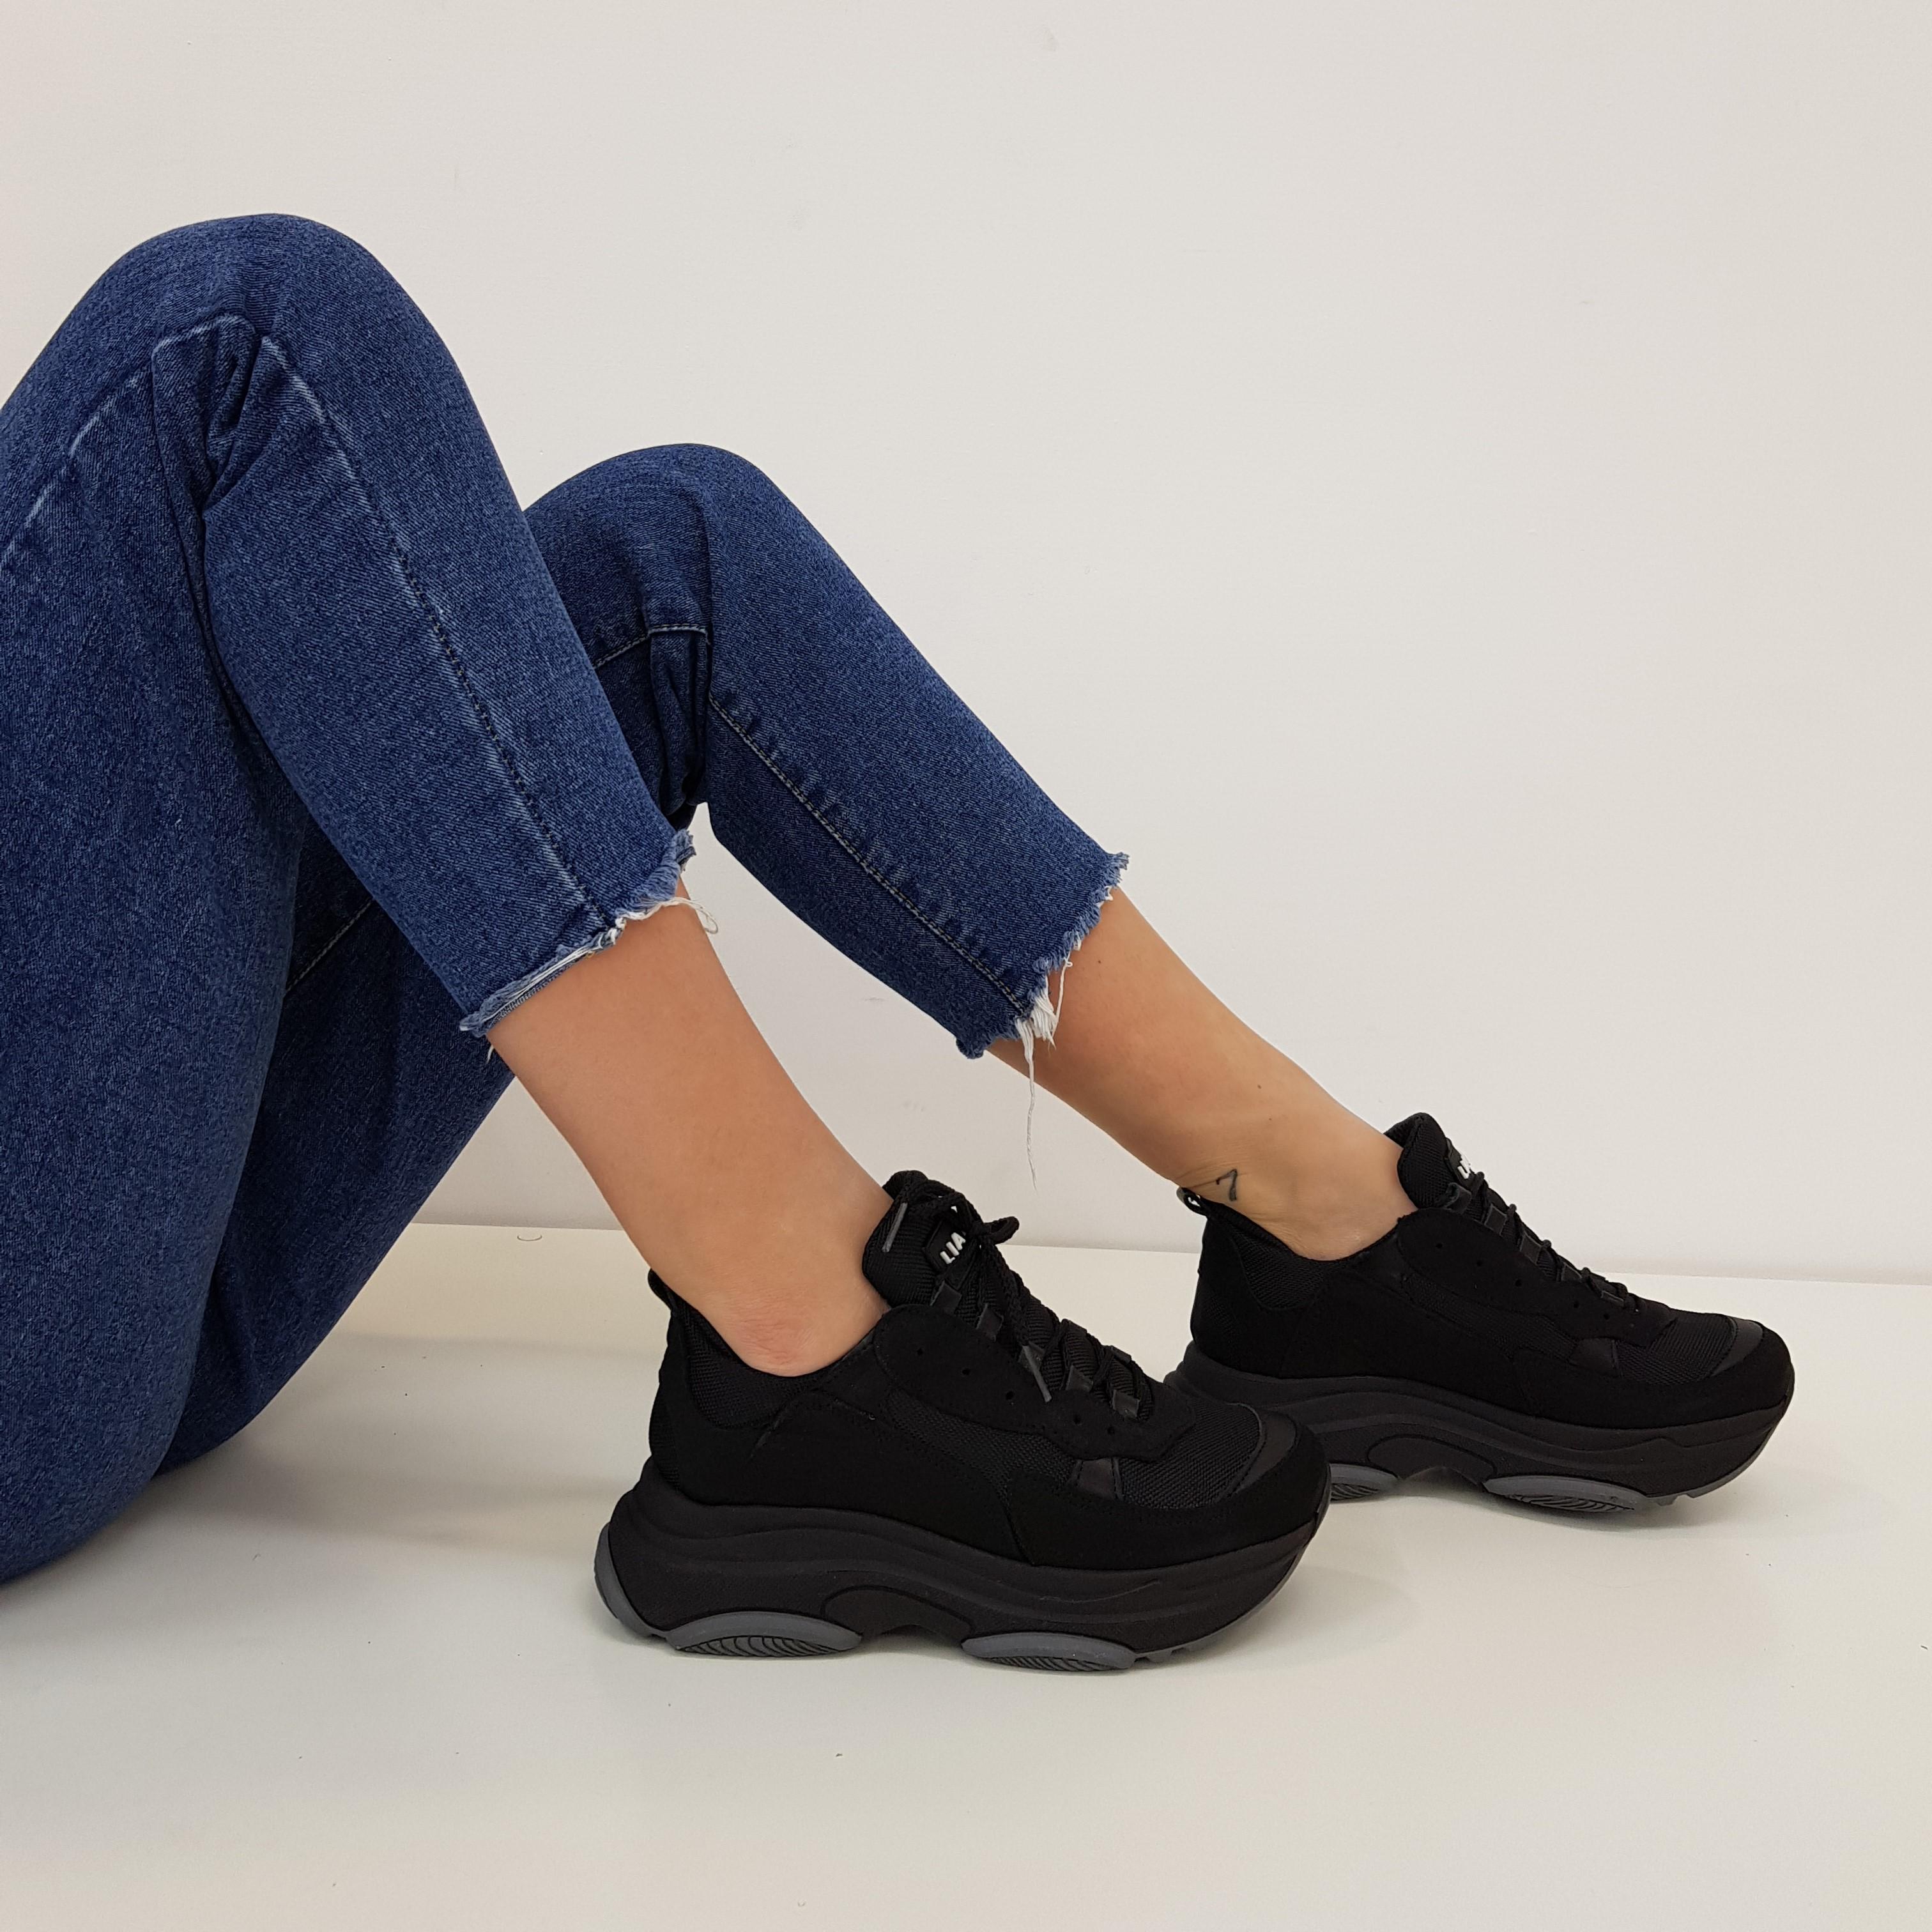 Sneakers lacci pelle nero kent1 total black - Lia diva scarpe ...